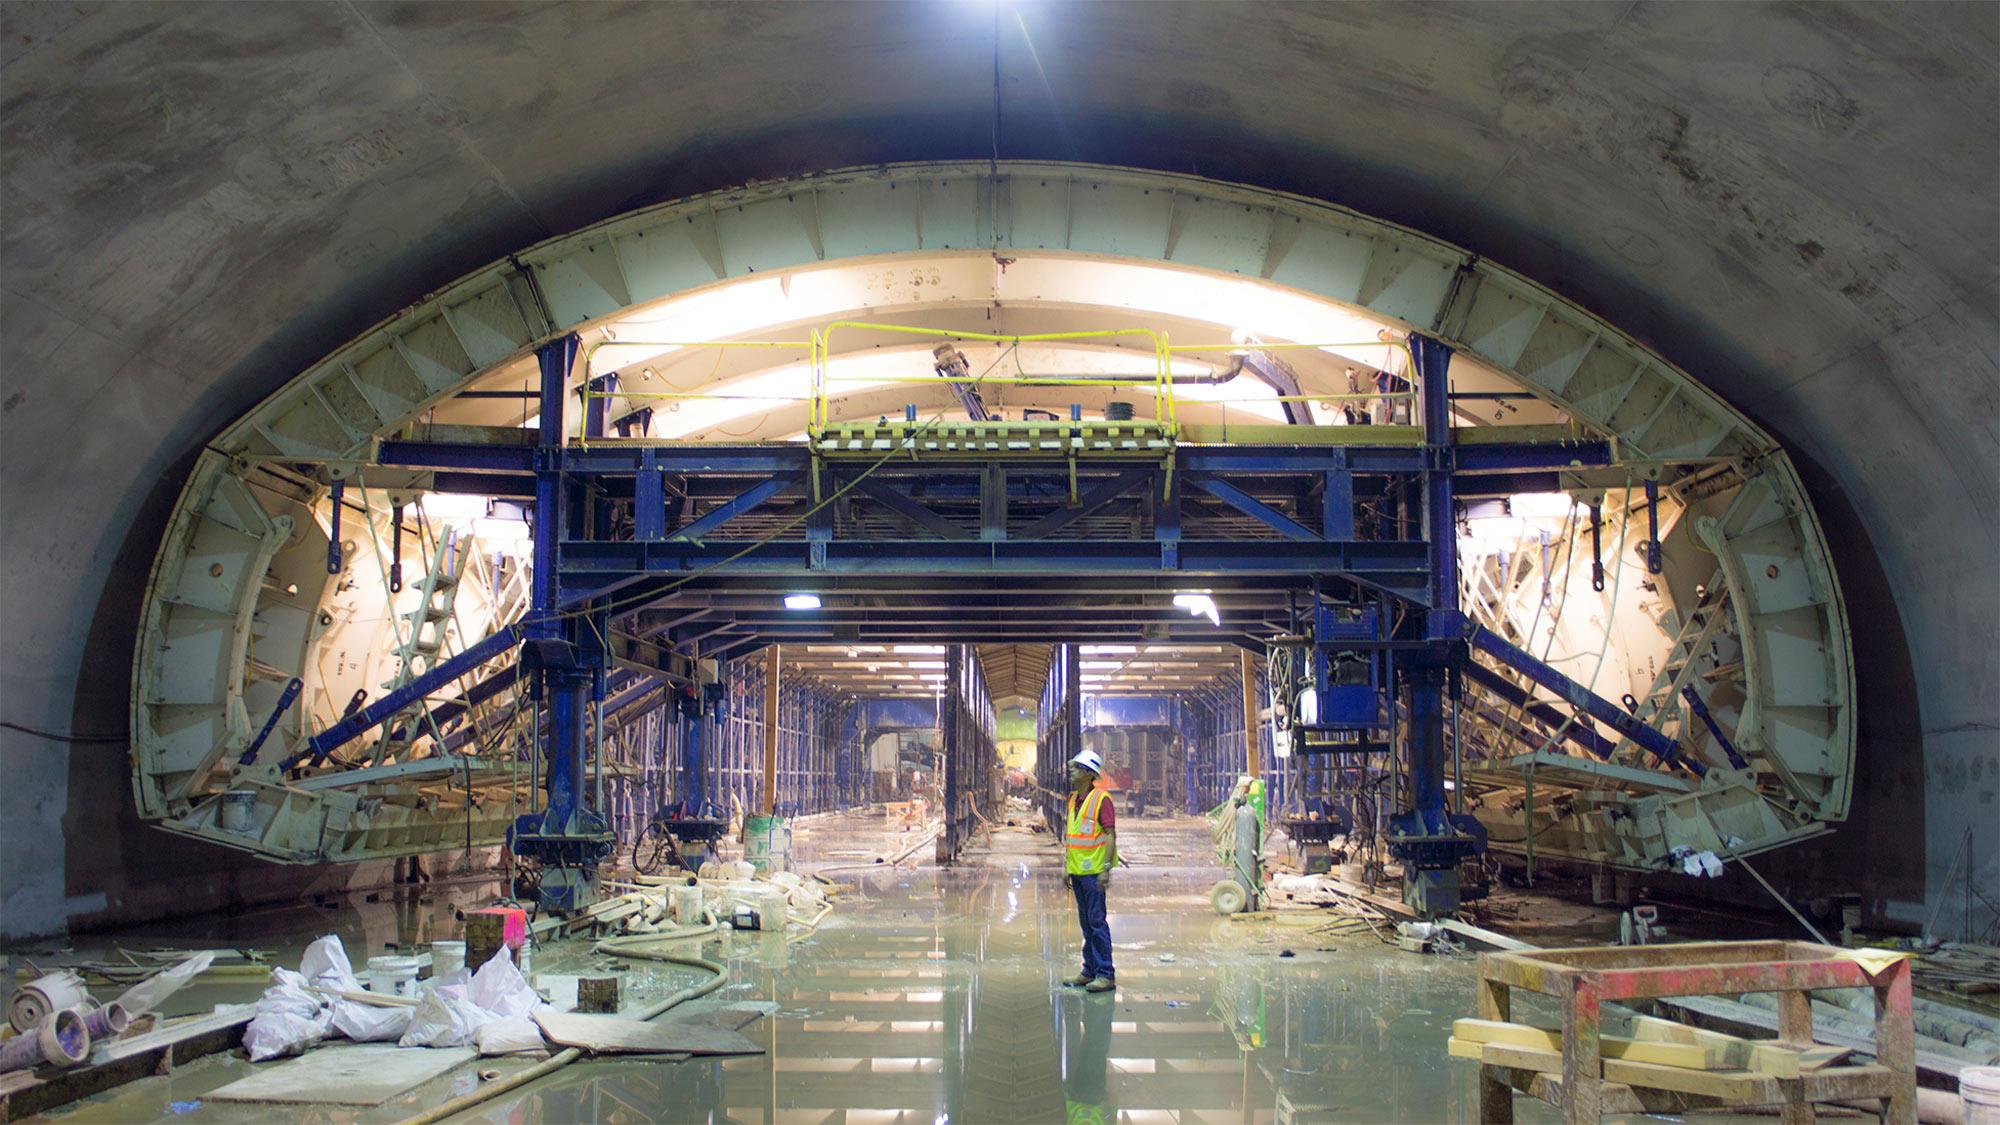 A peek inside the Second Avenue Subway's 72nd Street station. Photo: MTA Capital Construction / Rehema Trimiew.